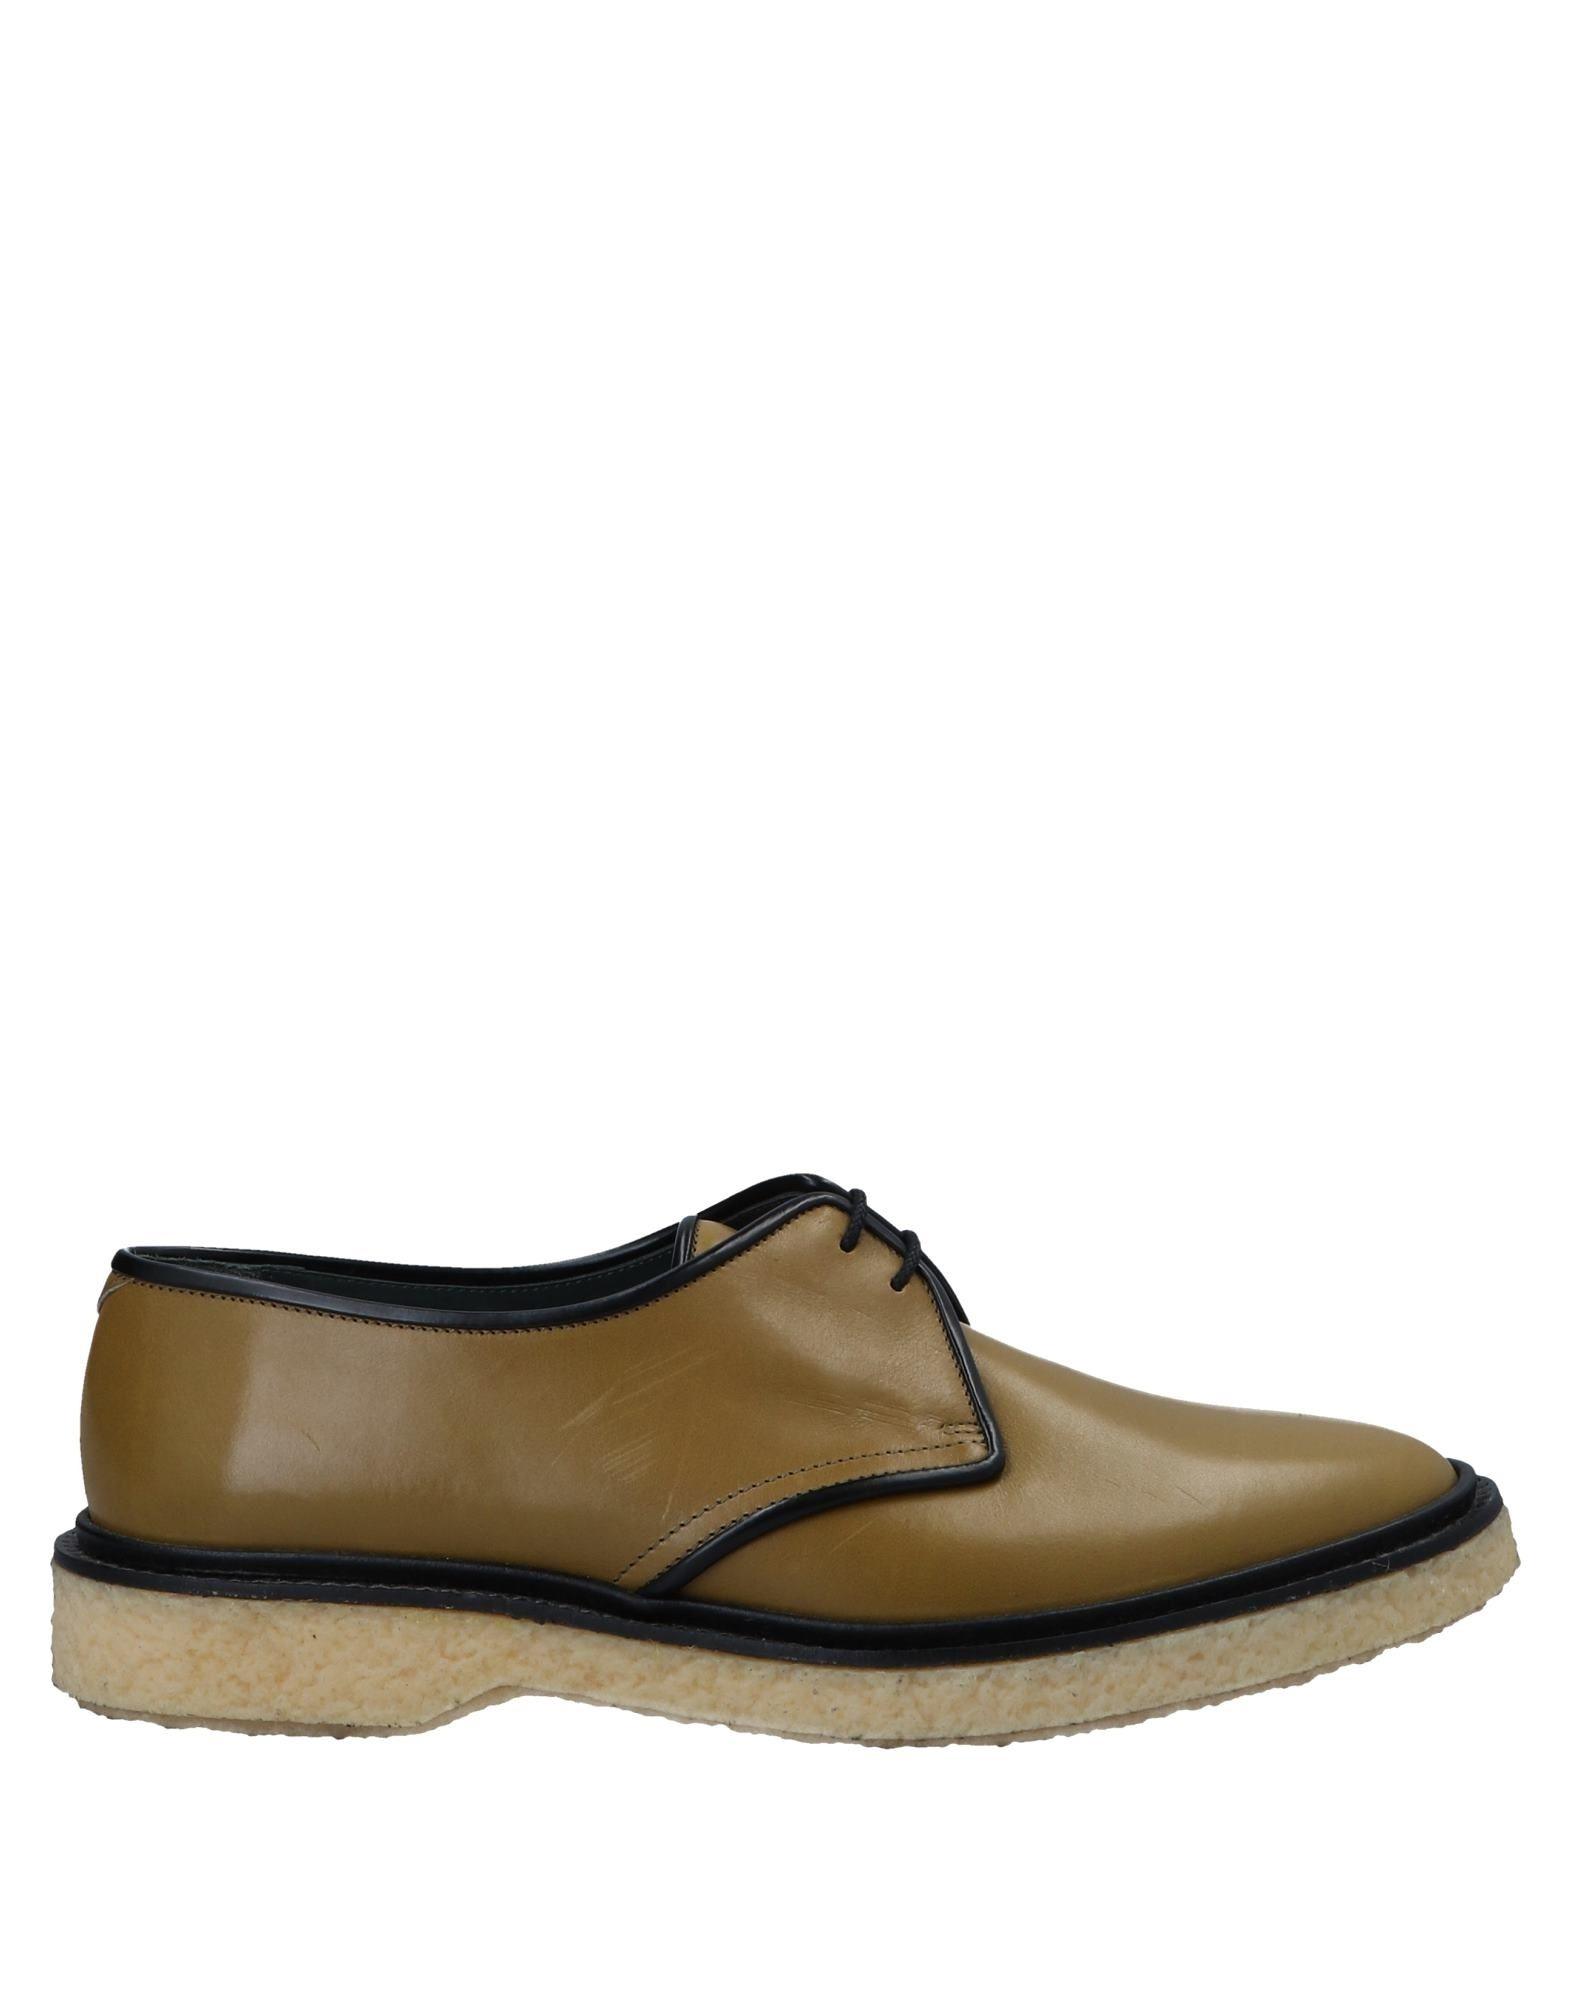 Adieu Schnürschuhe Herren  beliebte 44941834AR Gute Qualität beliebte  Schuhe 60ec9b